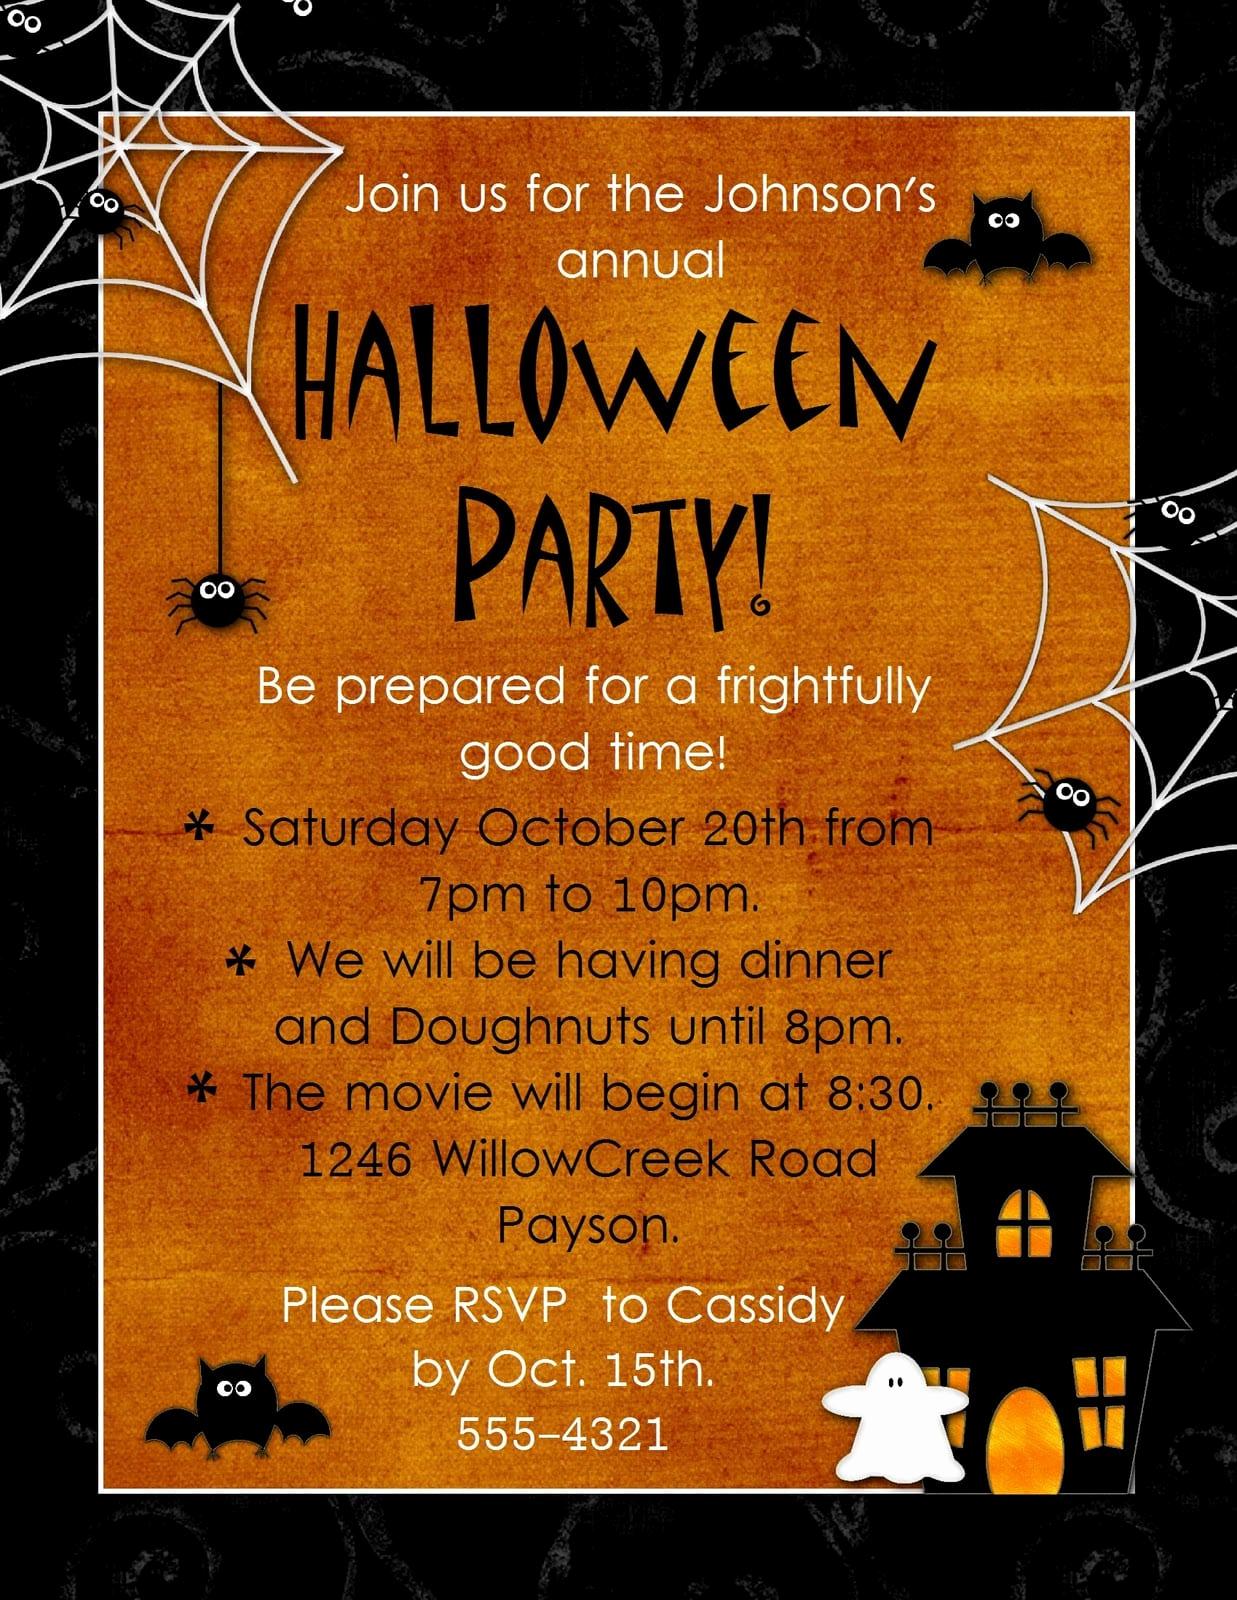 Halloween Party Invitations Templates Luxury Halloween Invitation Template Free